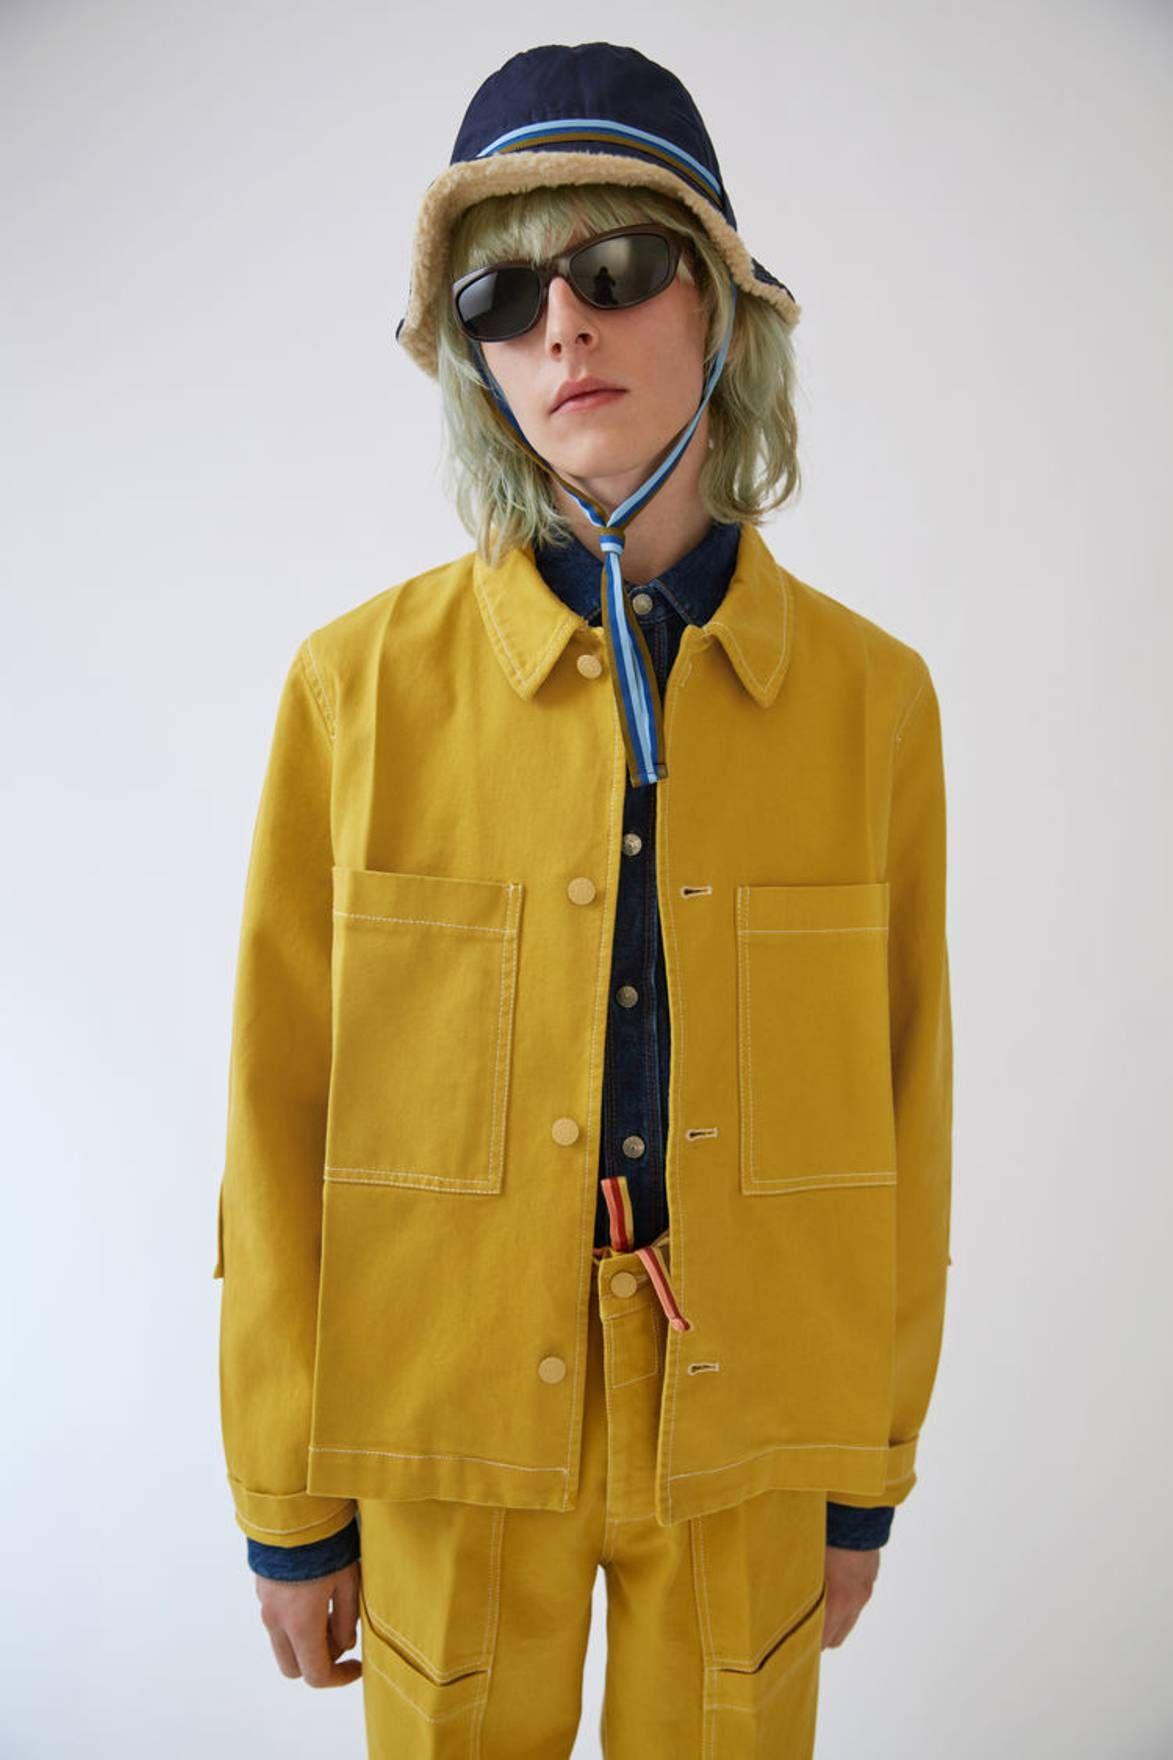 ba97e49d02 Acne Studios Bla Konst Denim Jacket Size US M   EU 48-50   2 - 5 ...